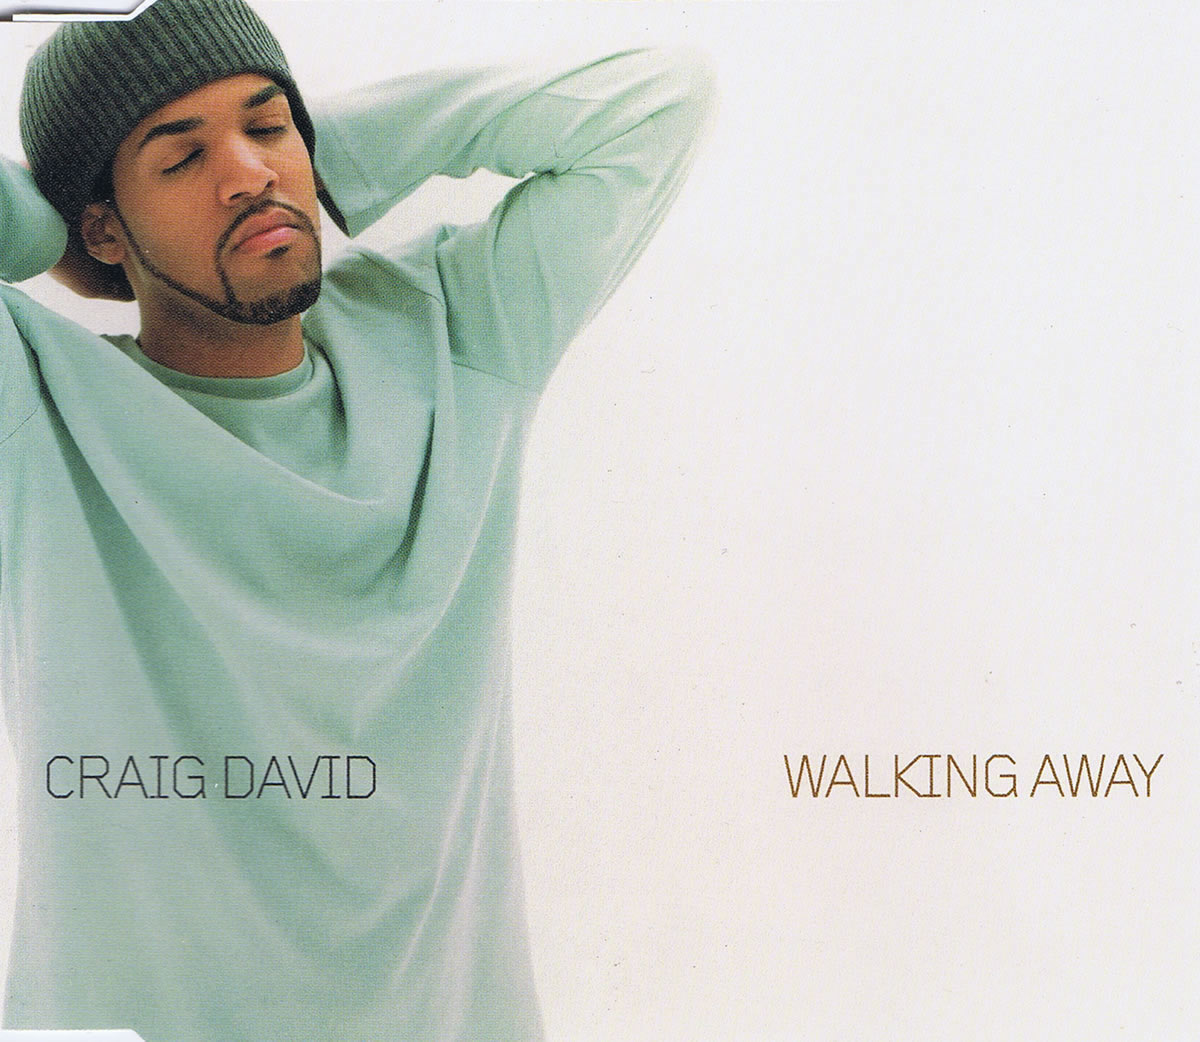 ultratop be - Craig David - Walking Away